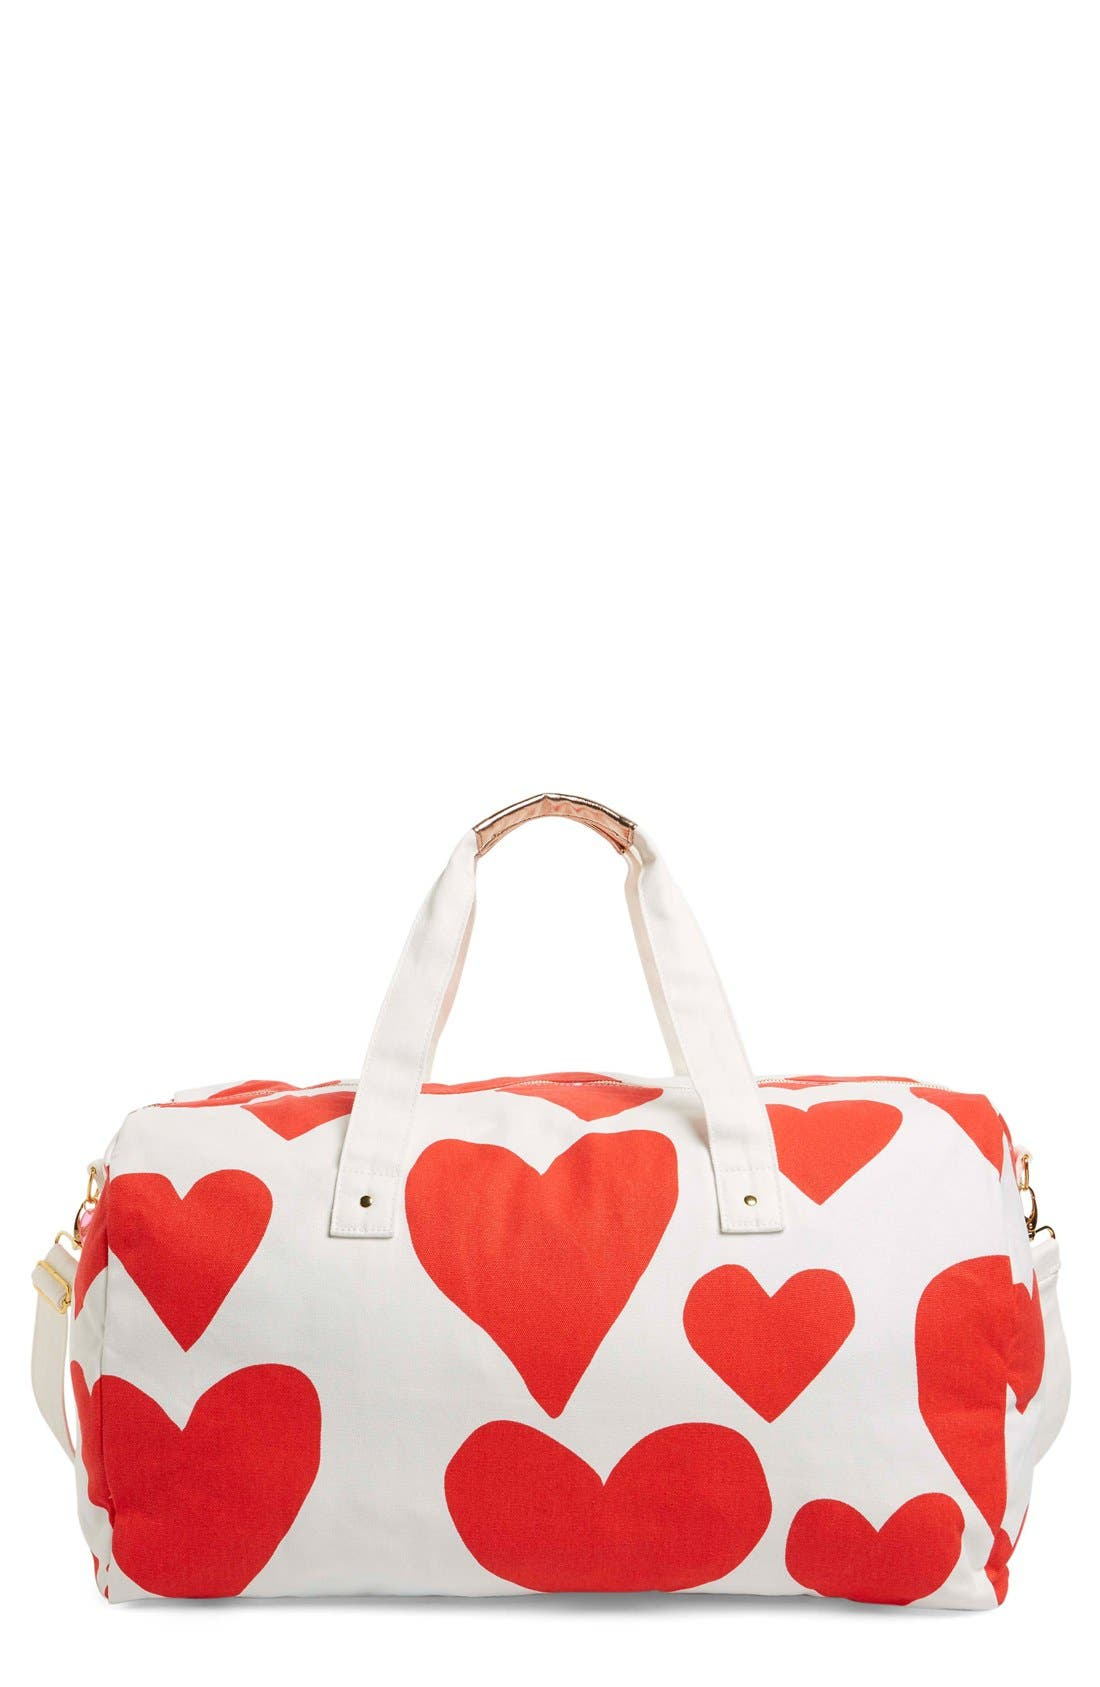 Main Image - ban.do 'Extreme Hearts' Canvas Duffel Bag